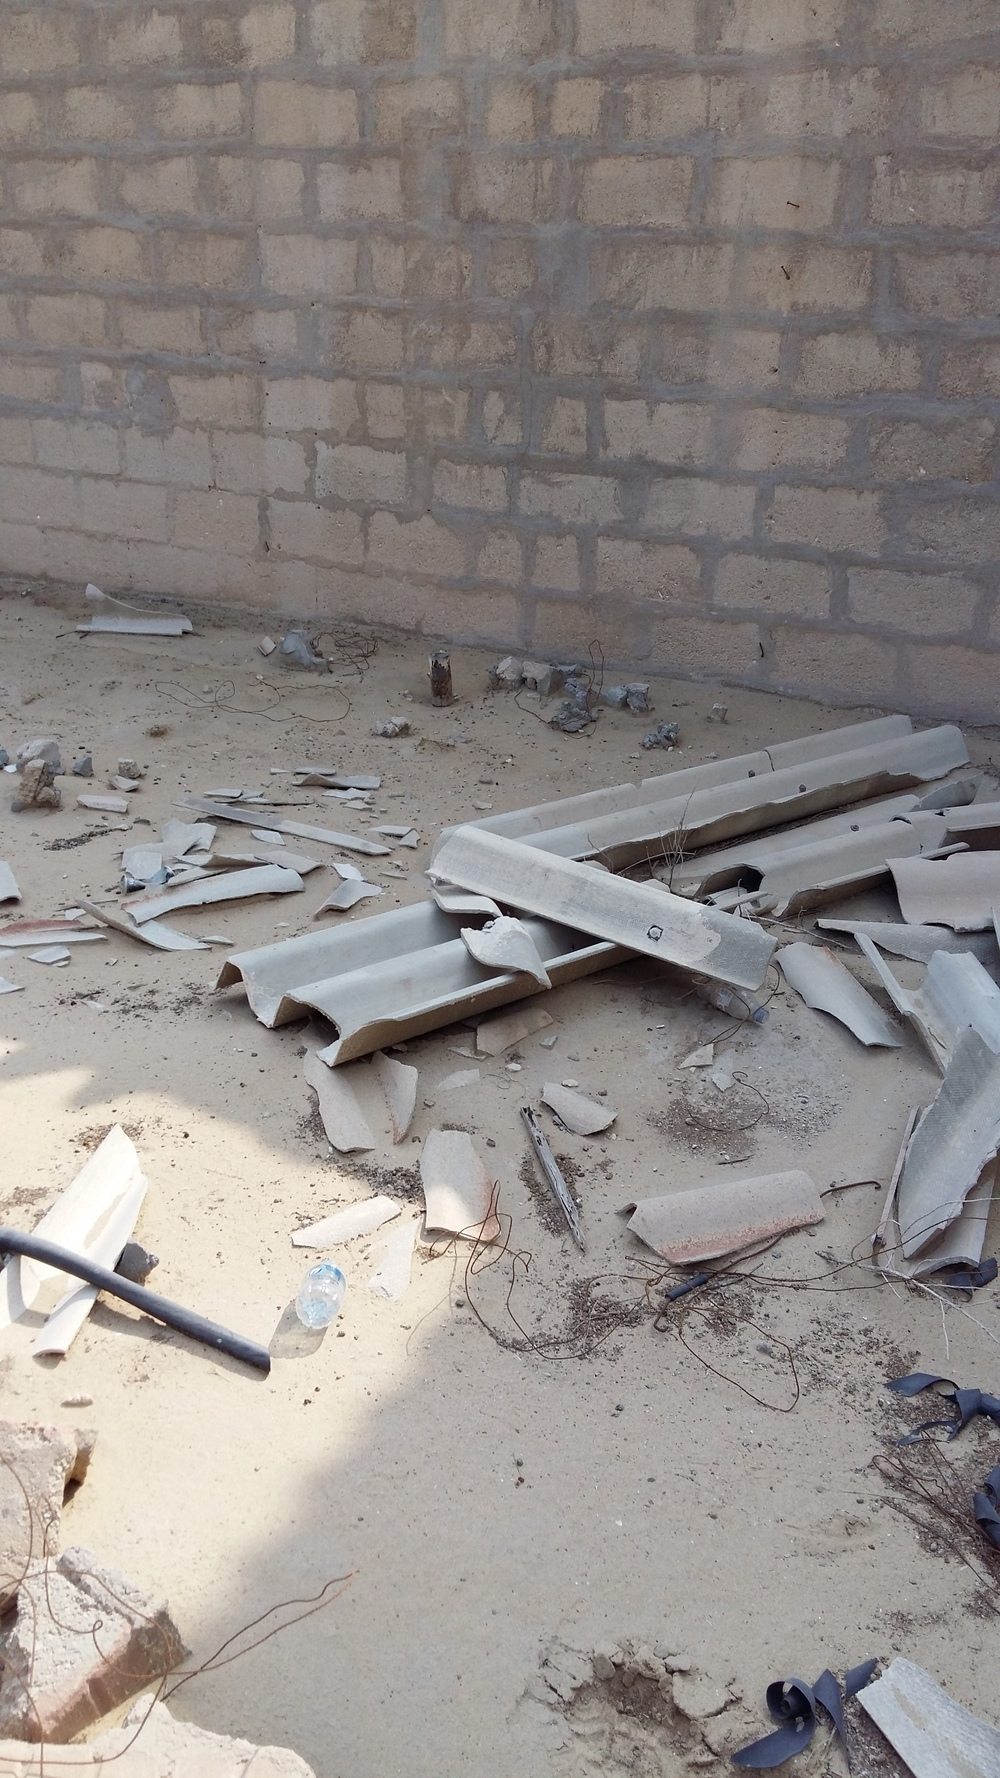 Asbestos Cement Sheeting Debris, Doha, Qatar